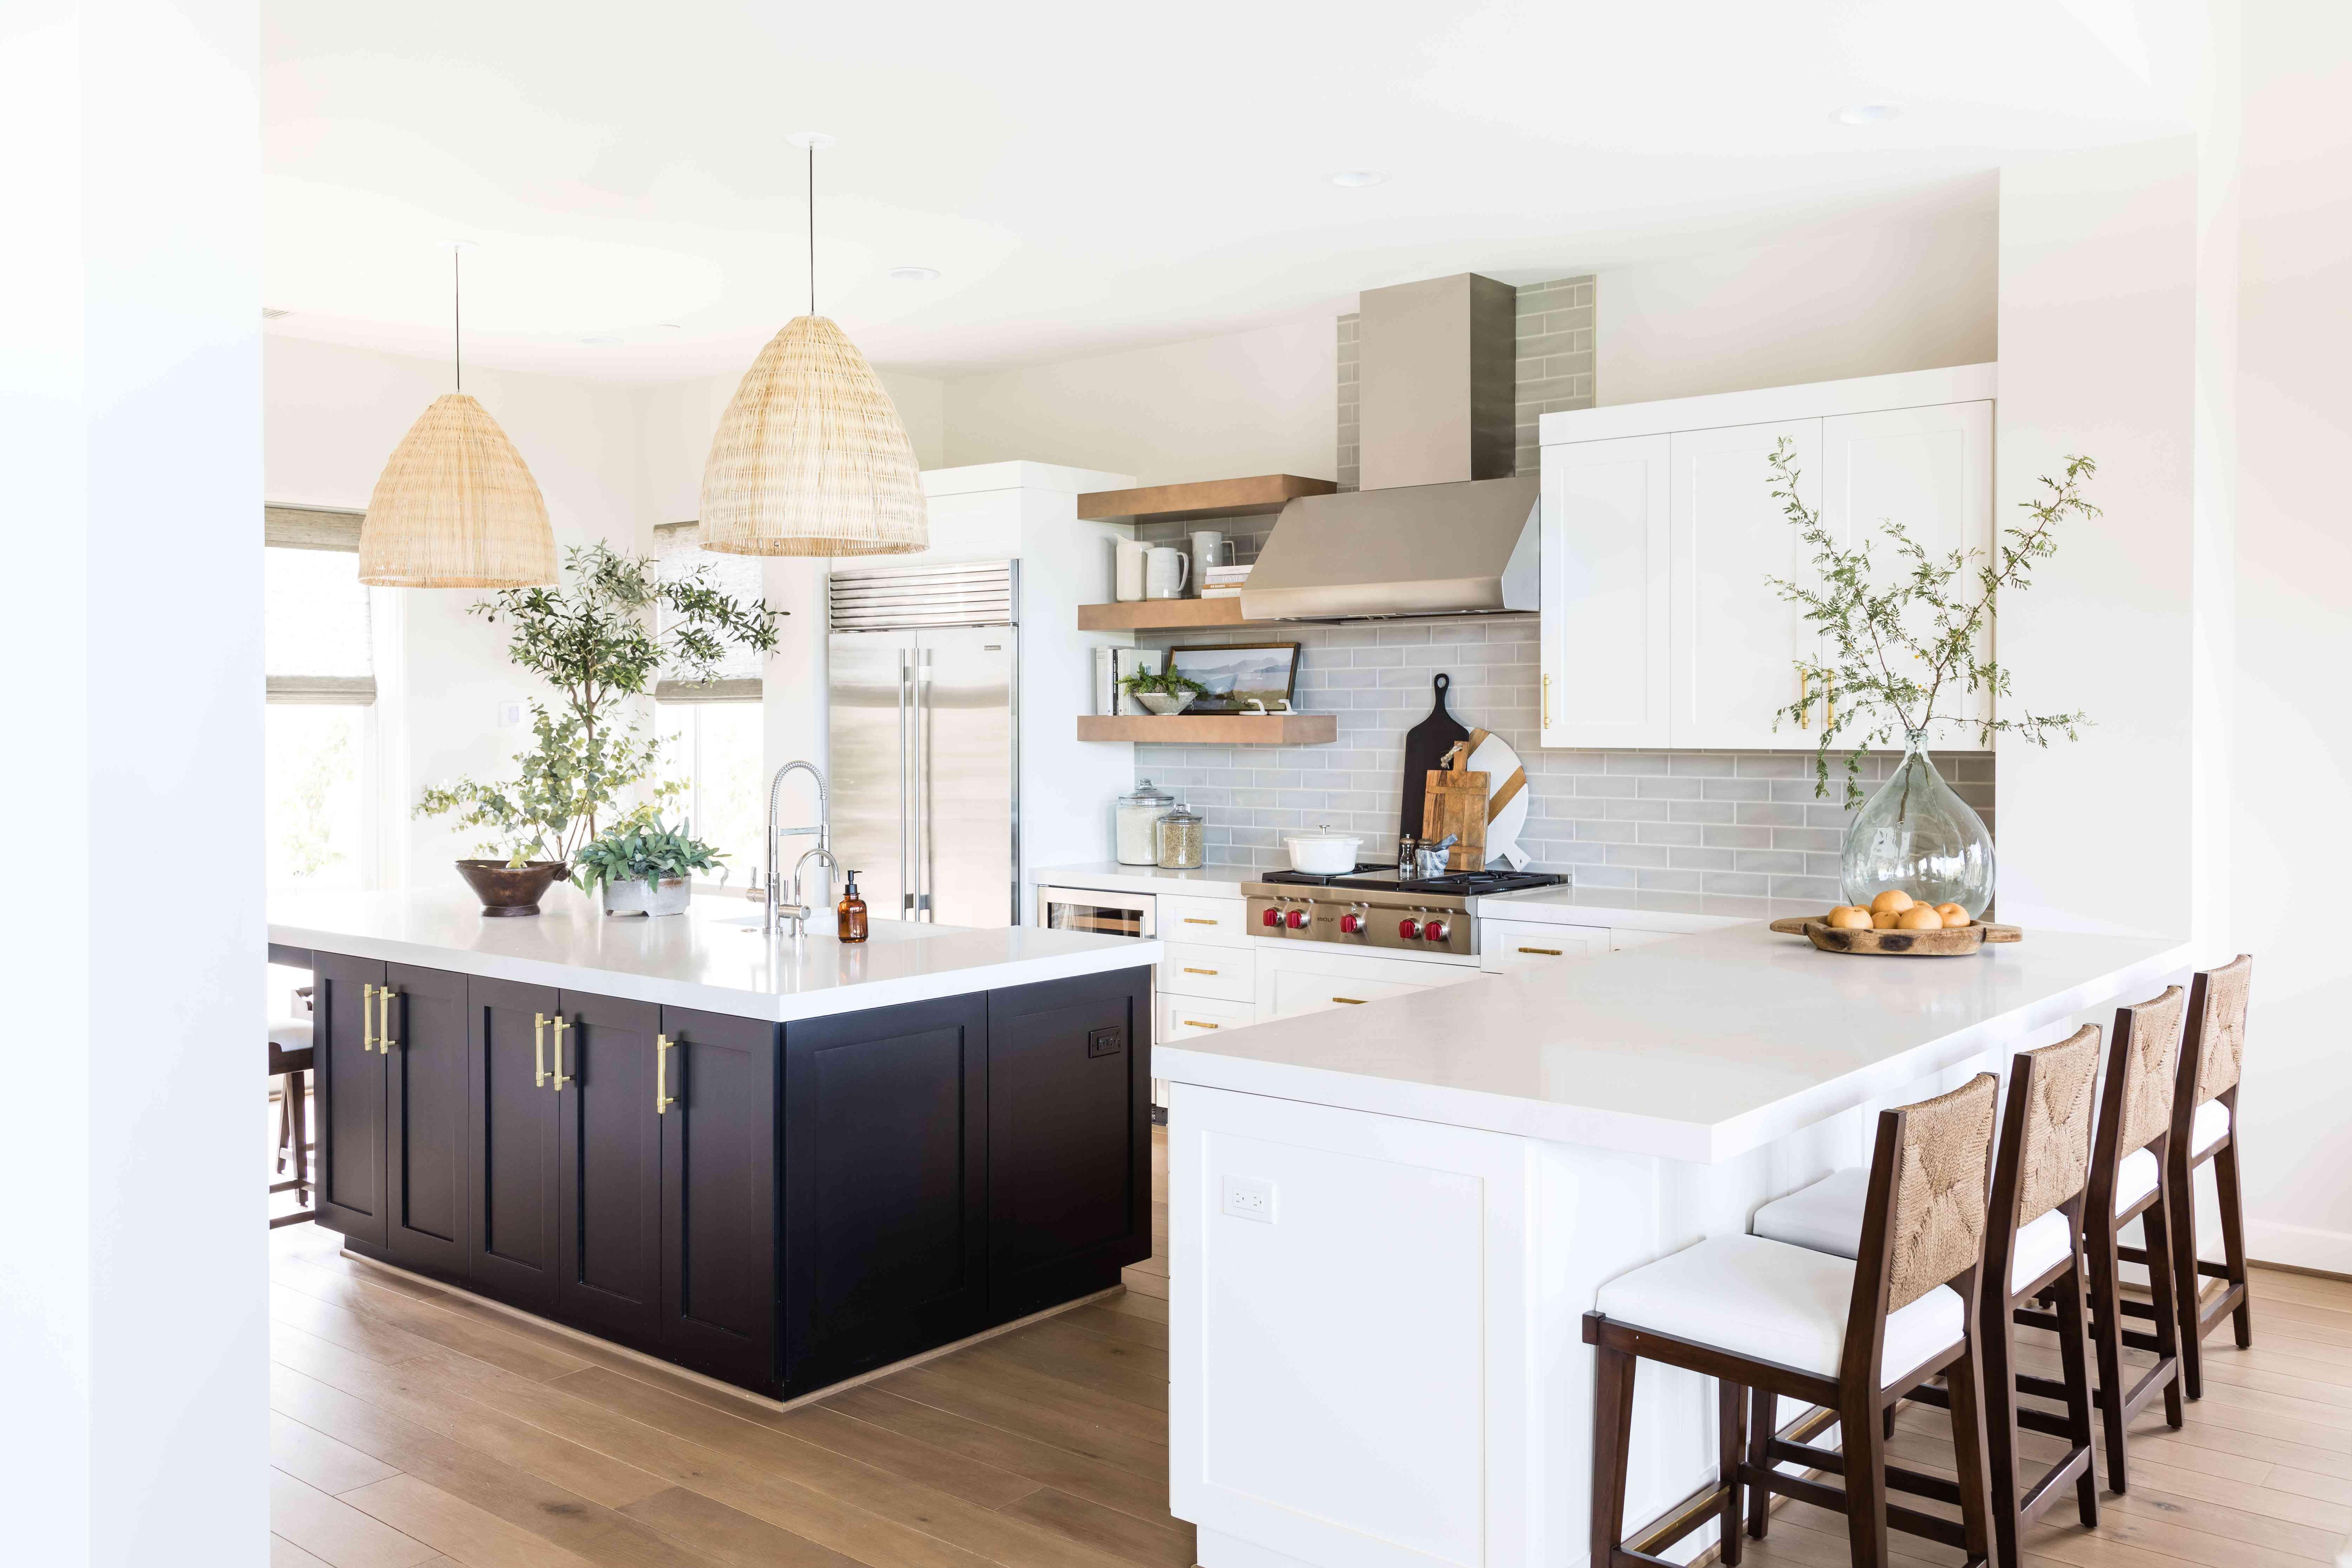 visita a casa de interiores de sal pura - cocina